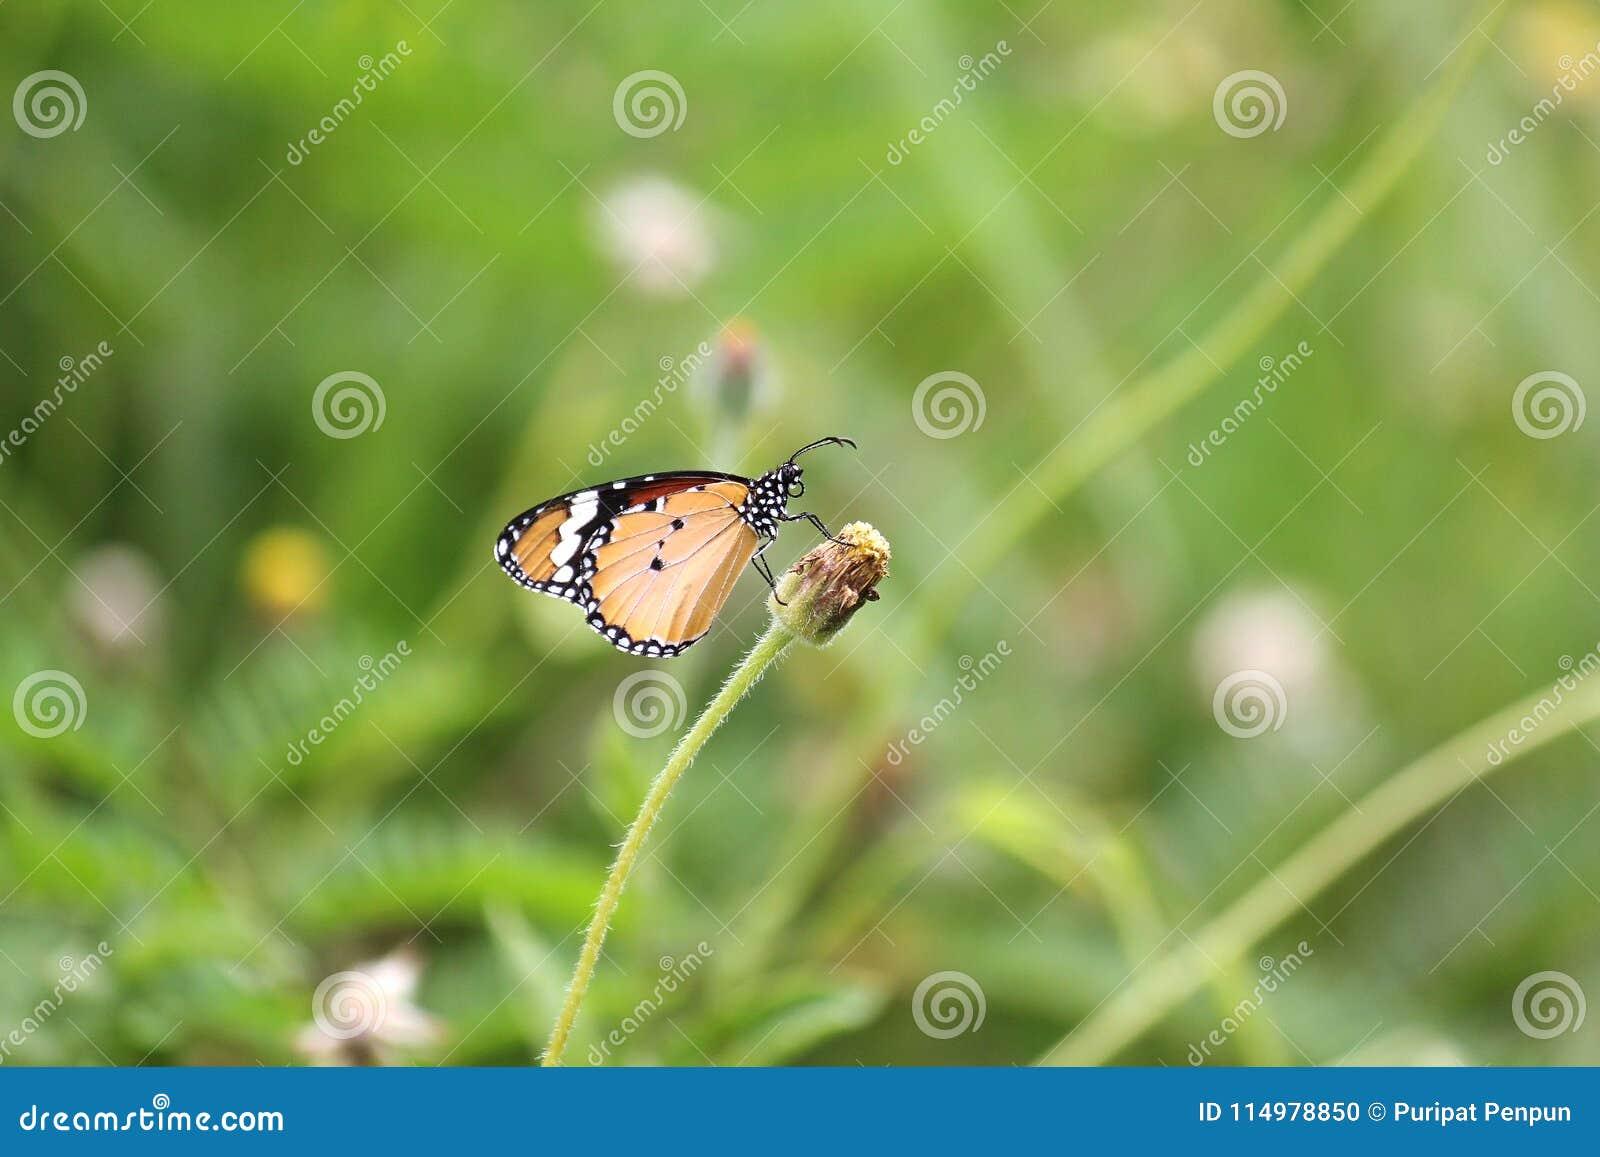 The Plain Tiger Danaus chrysippus chrysippus Linnaeus butterfly